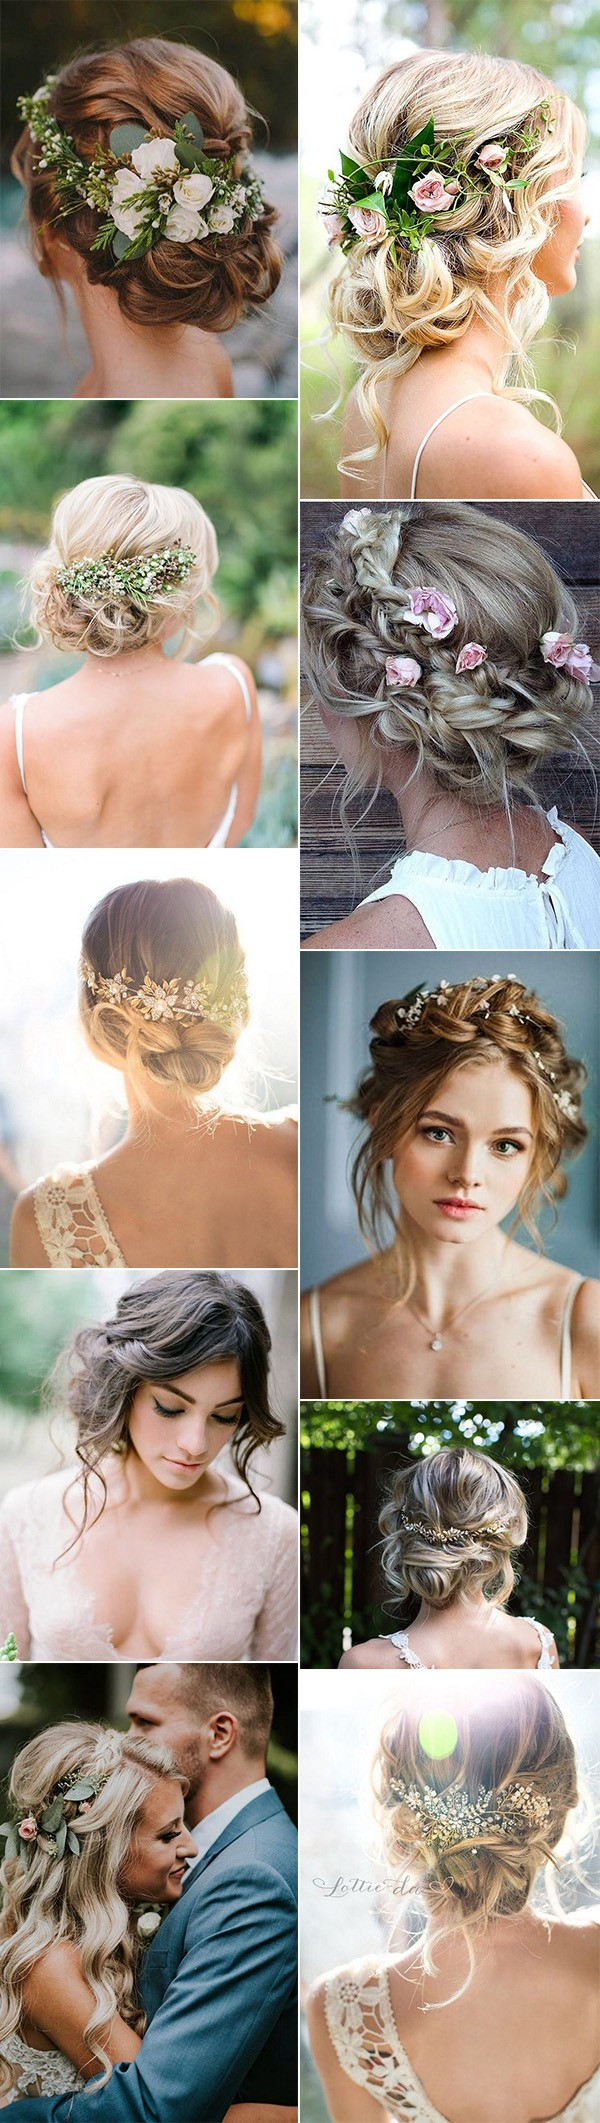 updos boho chic wedding hairstyles